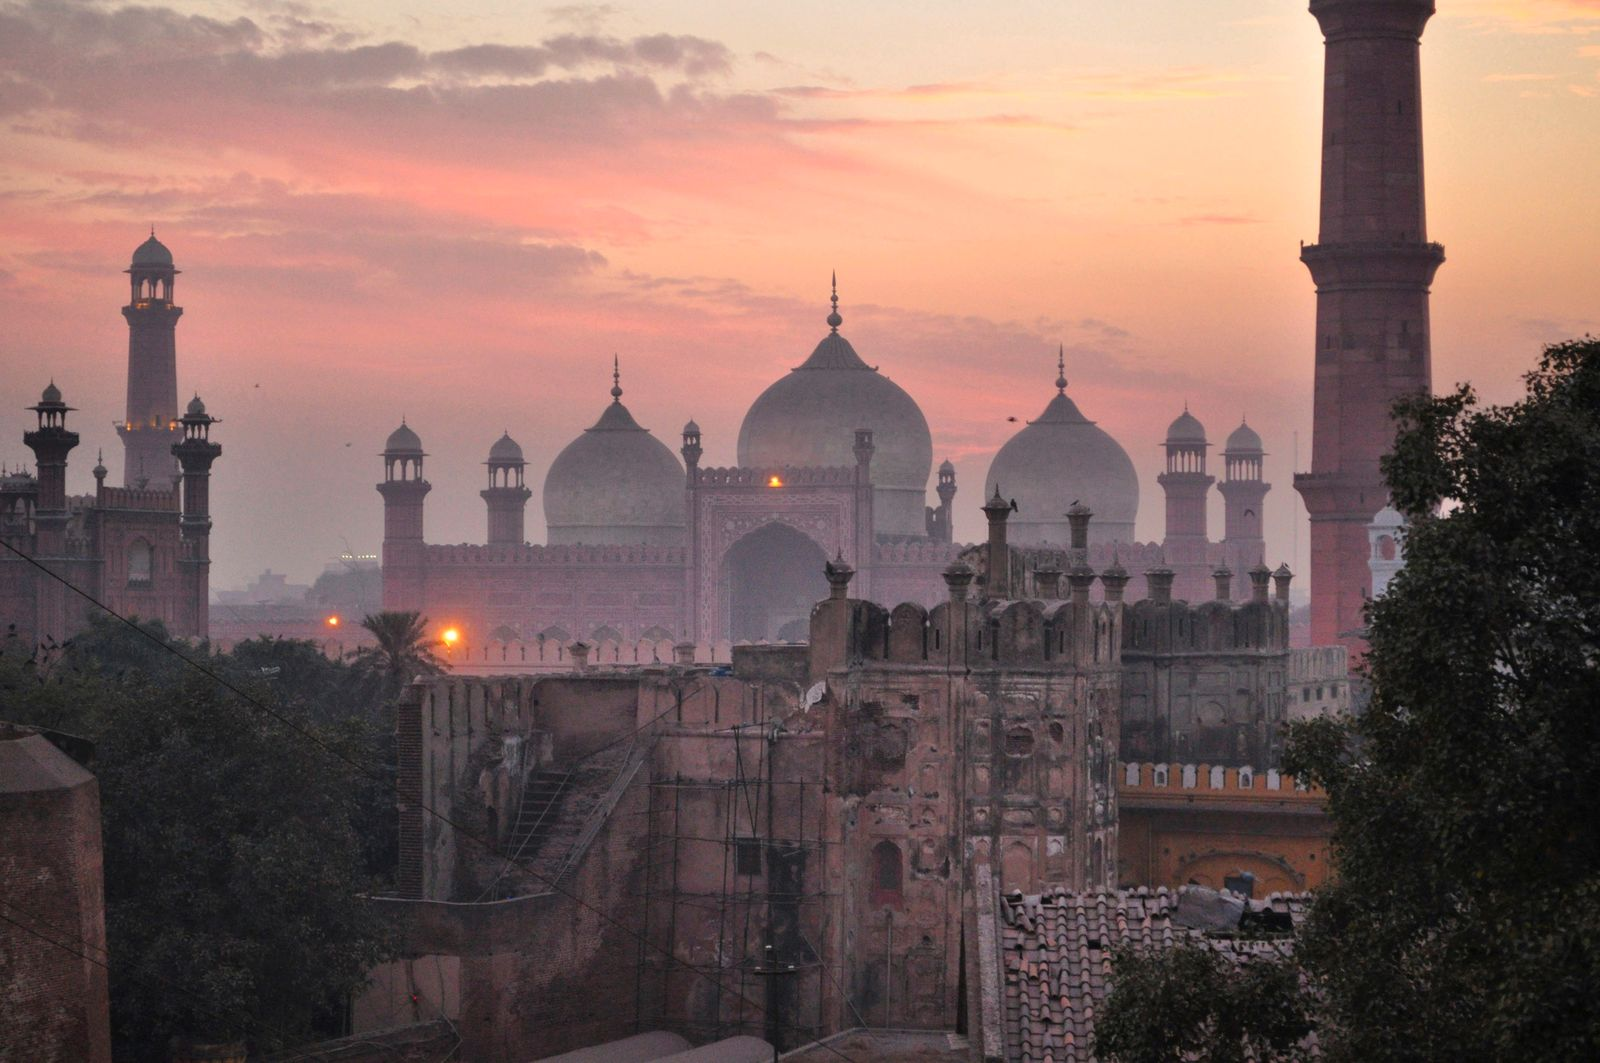 Badshahi Mosque Against Sky During Sunset